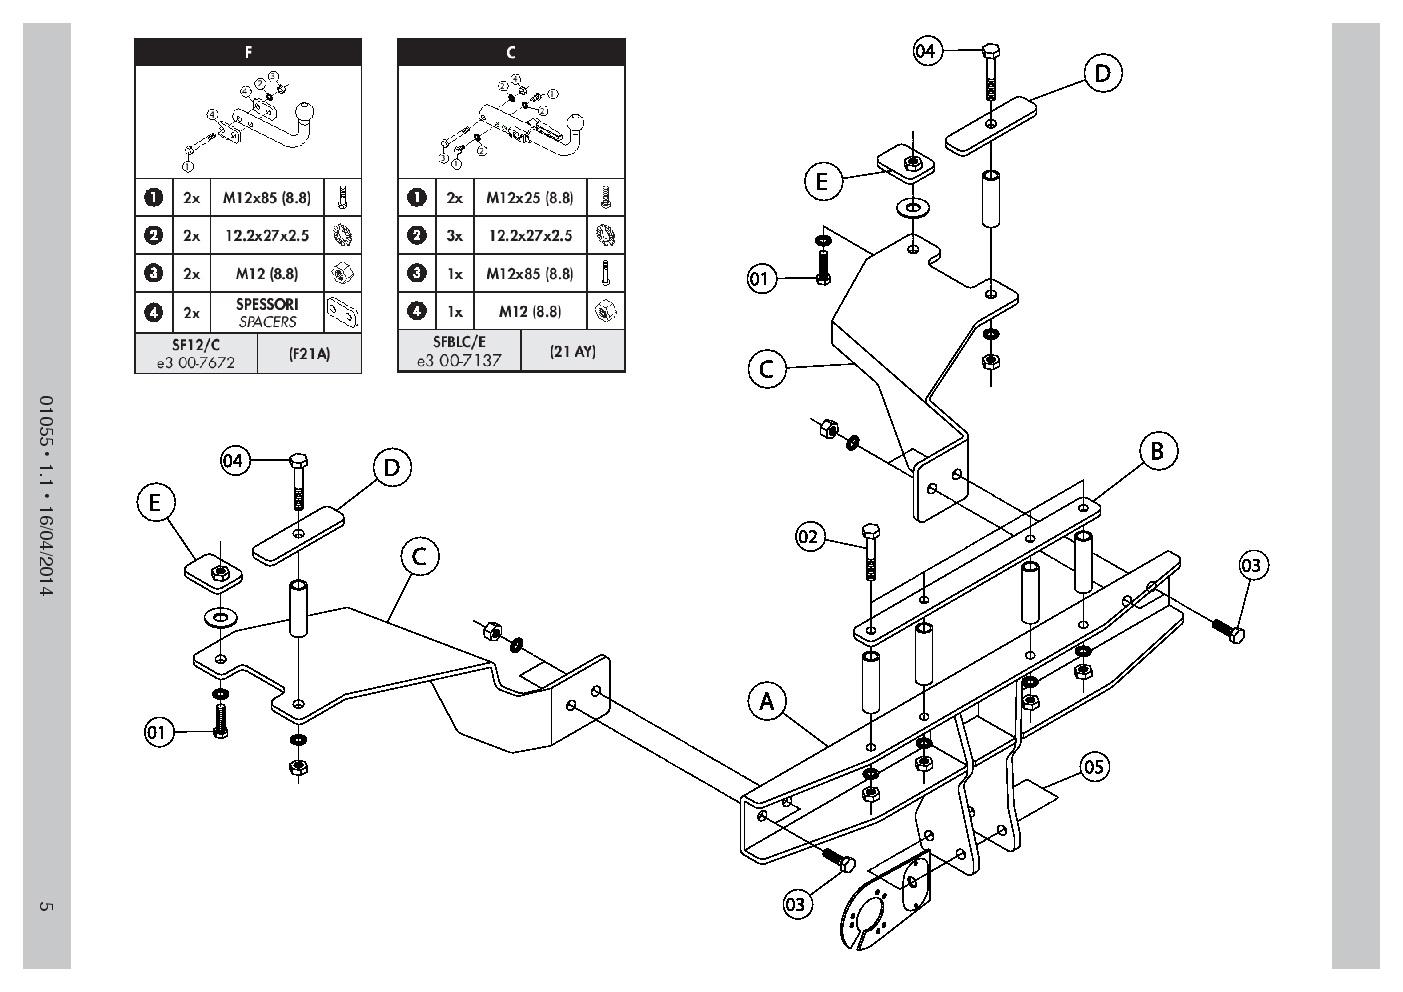 Detachable Towbar 13p C2 Wiring For Alfa Romeo 159